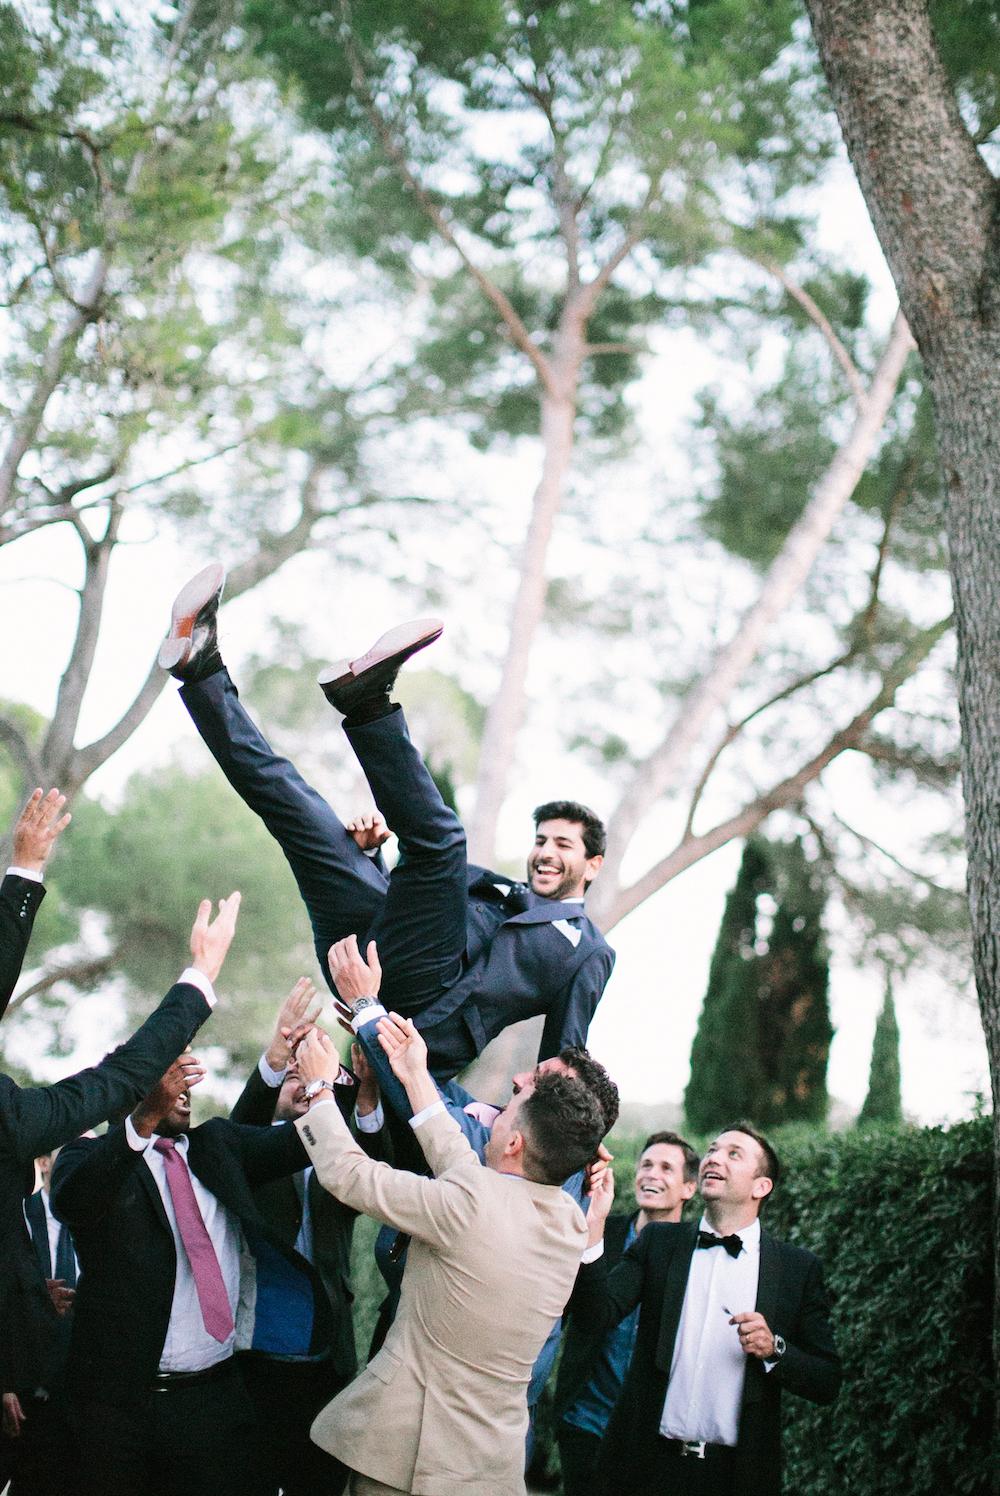 ©-saya-photography-studio-ohlala-wedding-photographer-photographe-mariage-chateau-de-la-tour-vaucros-avignon-258.jpg